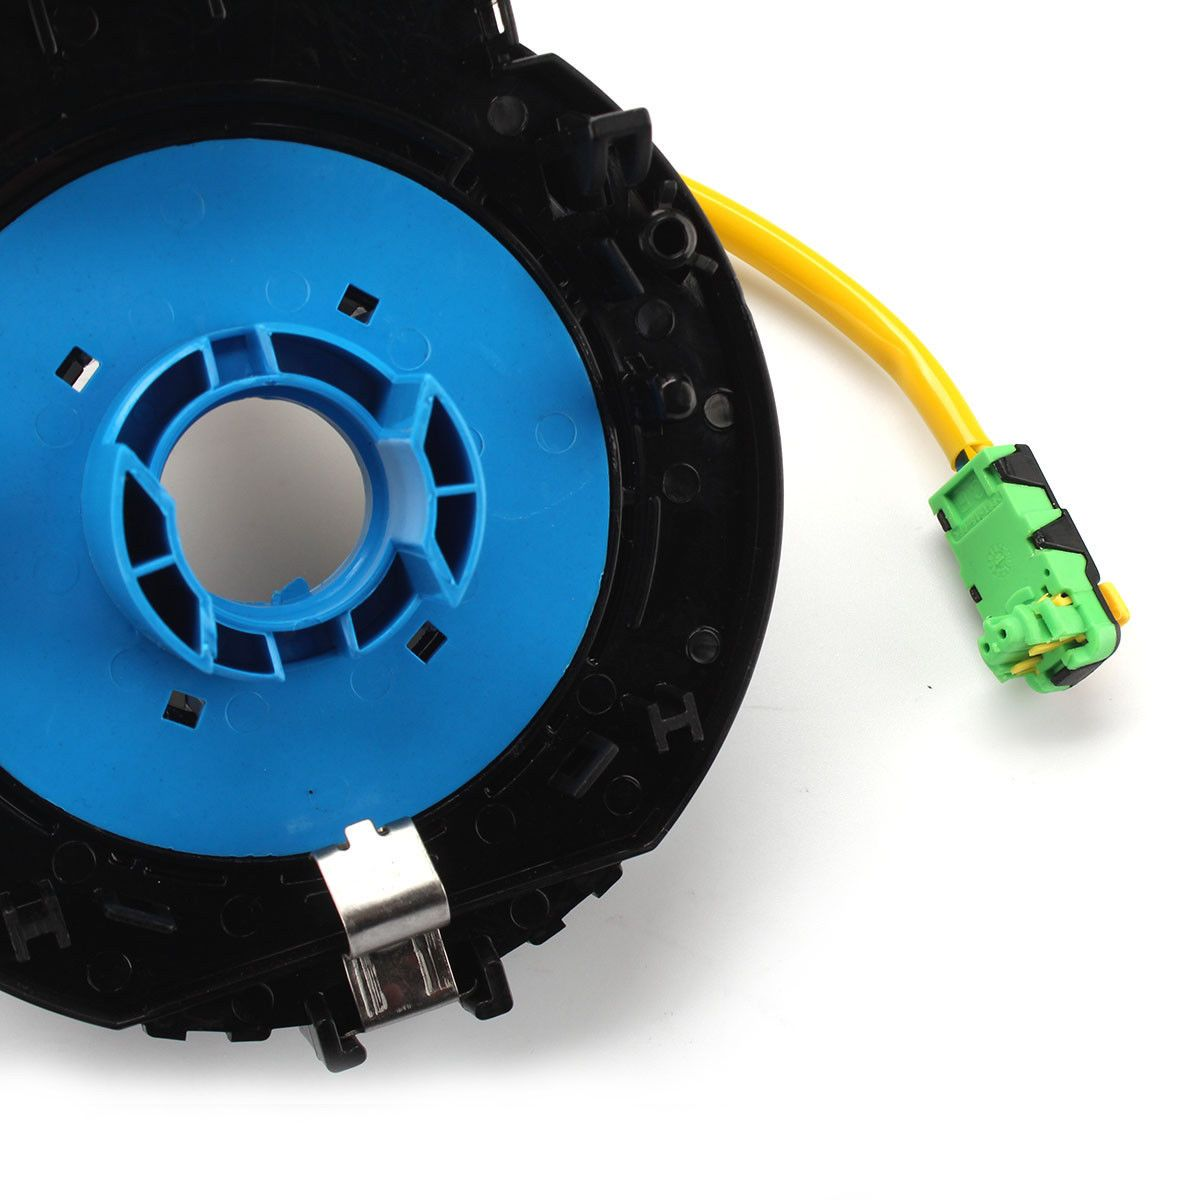 Cinta Airbag Hard Disk Santa Fe 2.7 E 3.5 Apos 2006 - 93490-2b200